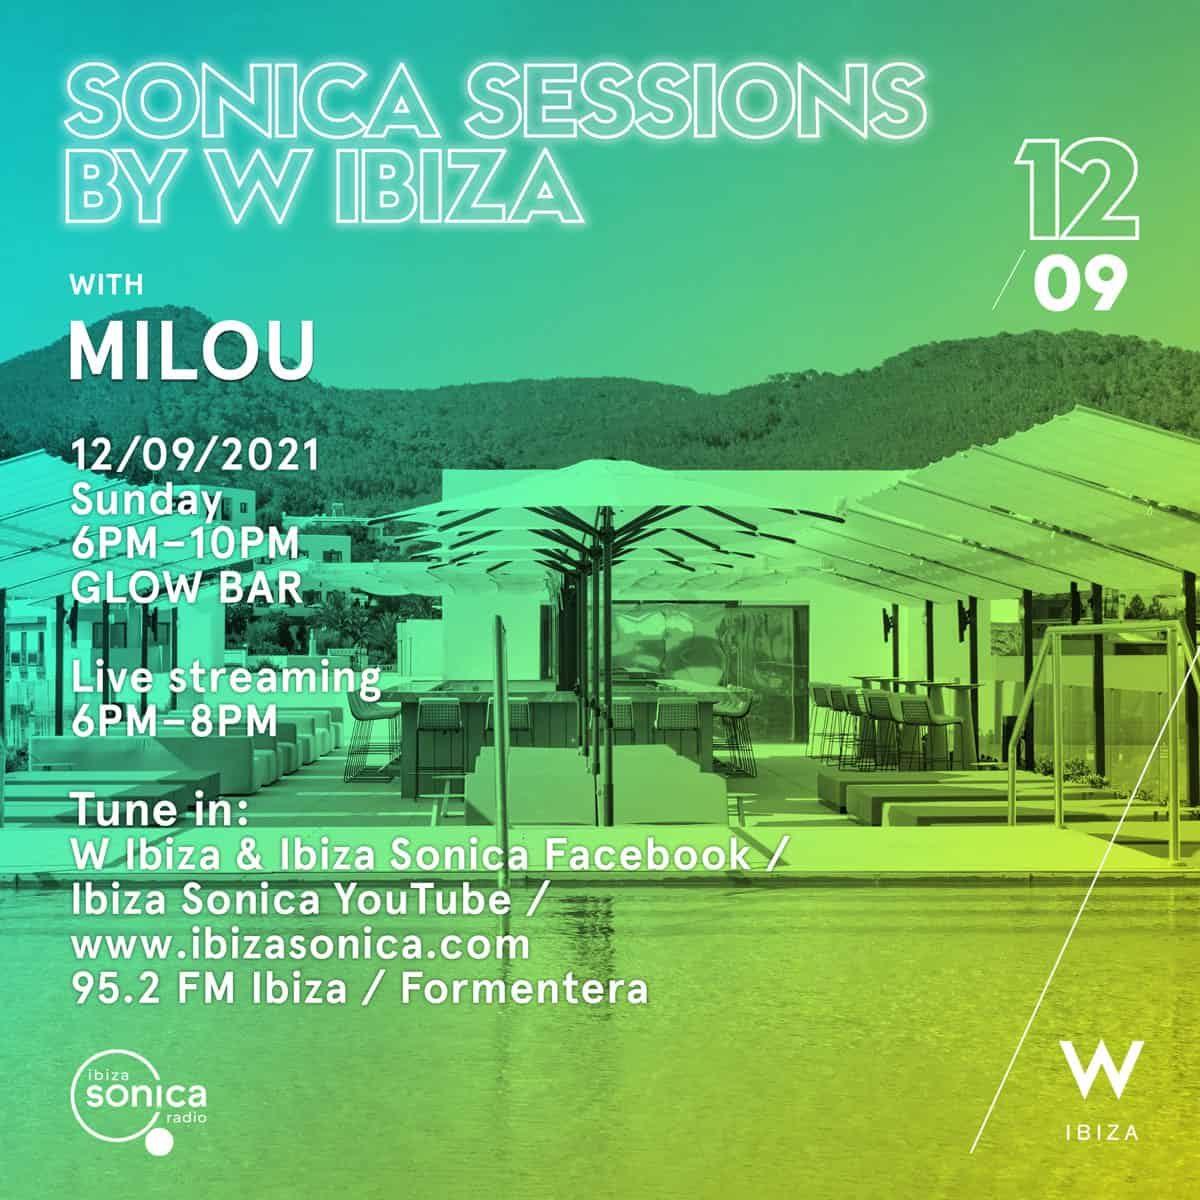 sonica-sessions-w-ibiza-hotel-2021-milou-welcometoibiza